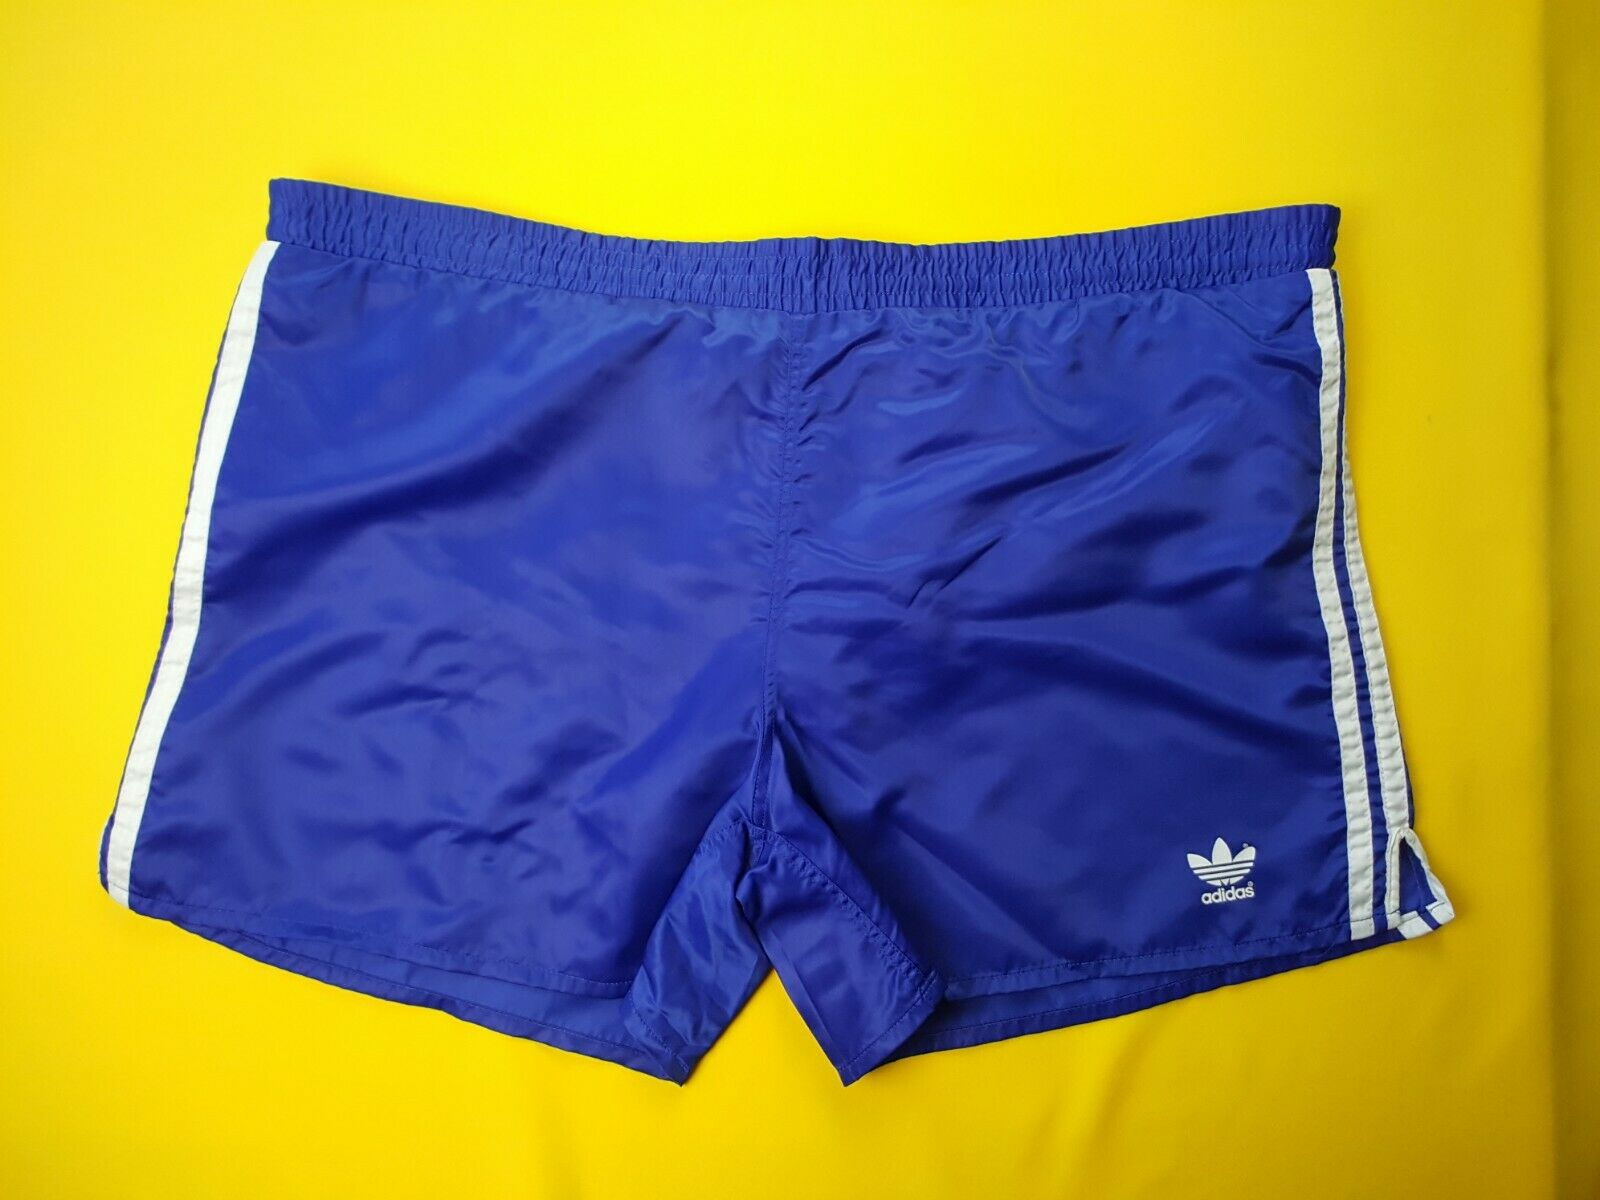 8b4276f92 4.9 5 Adidas vinatge retro shorts size XL 2XL soccer football ig93 ...